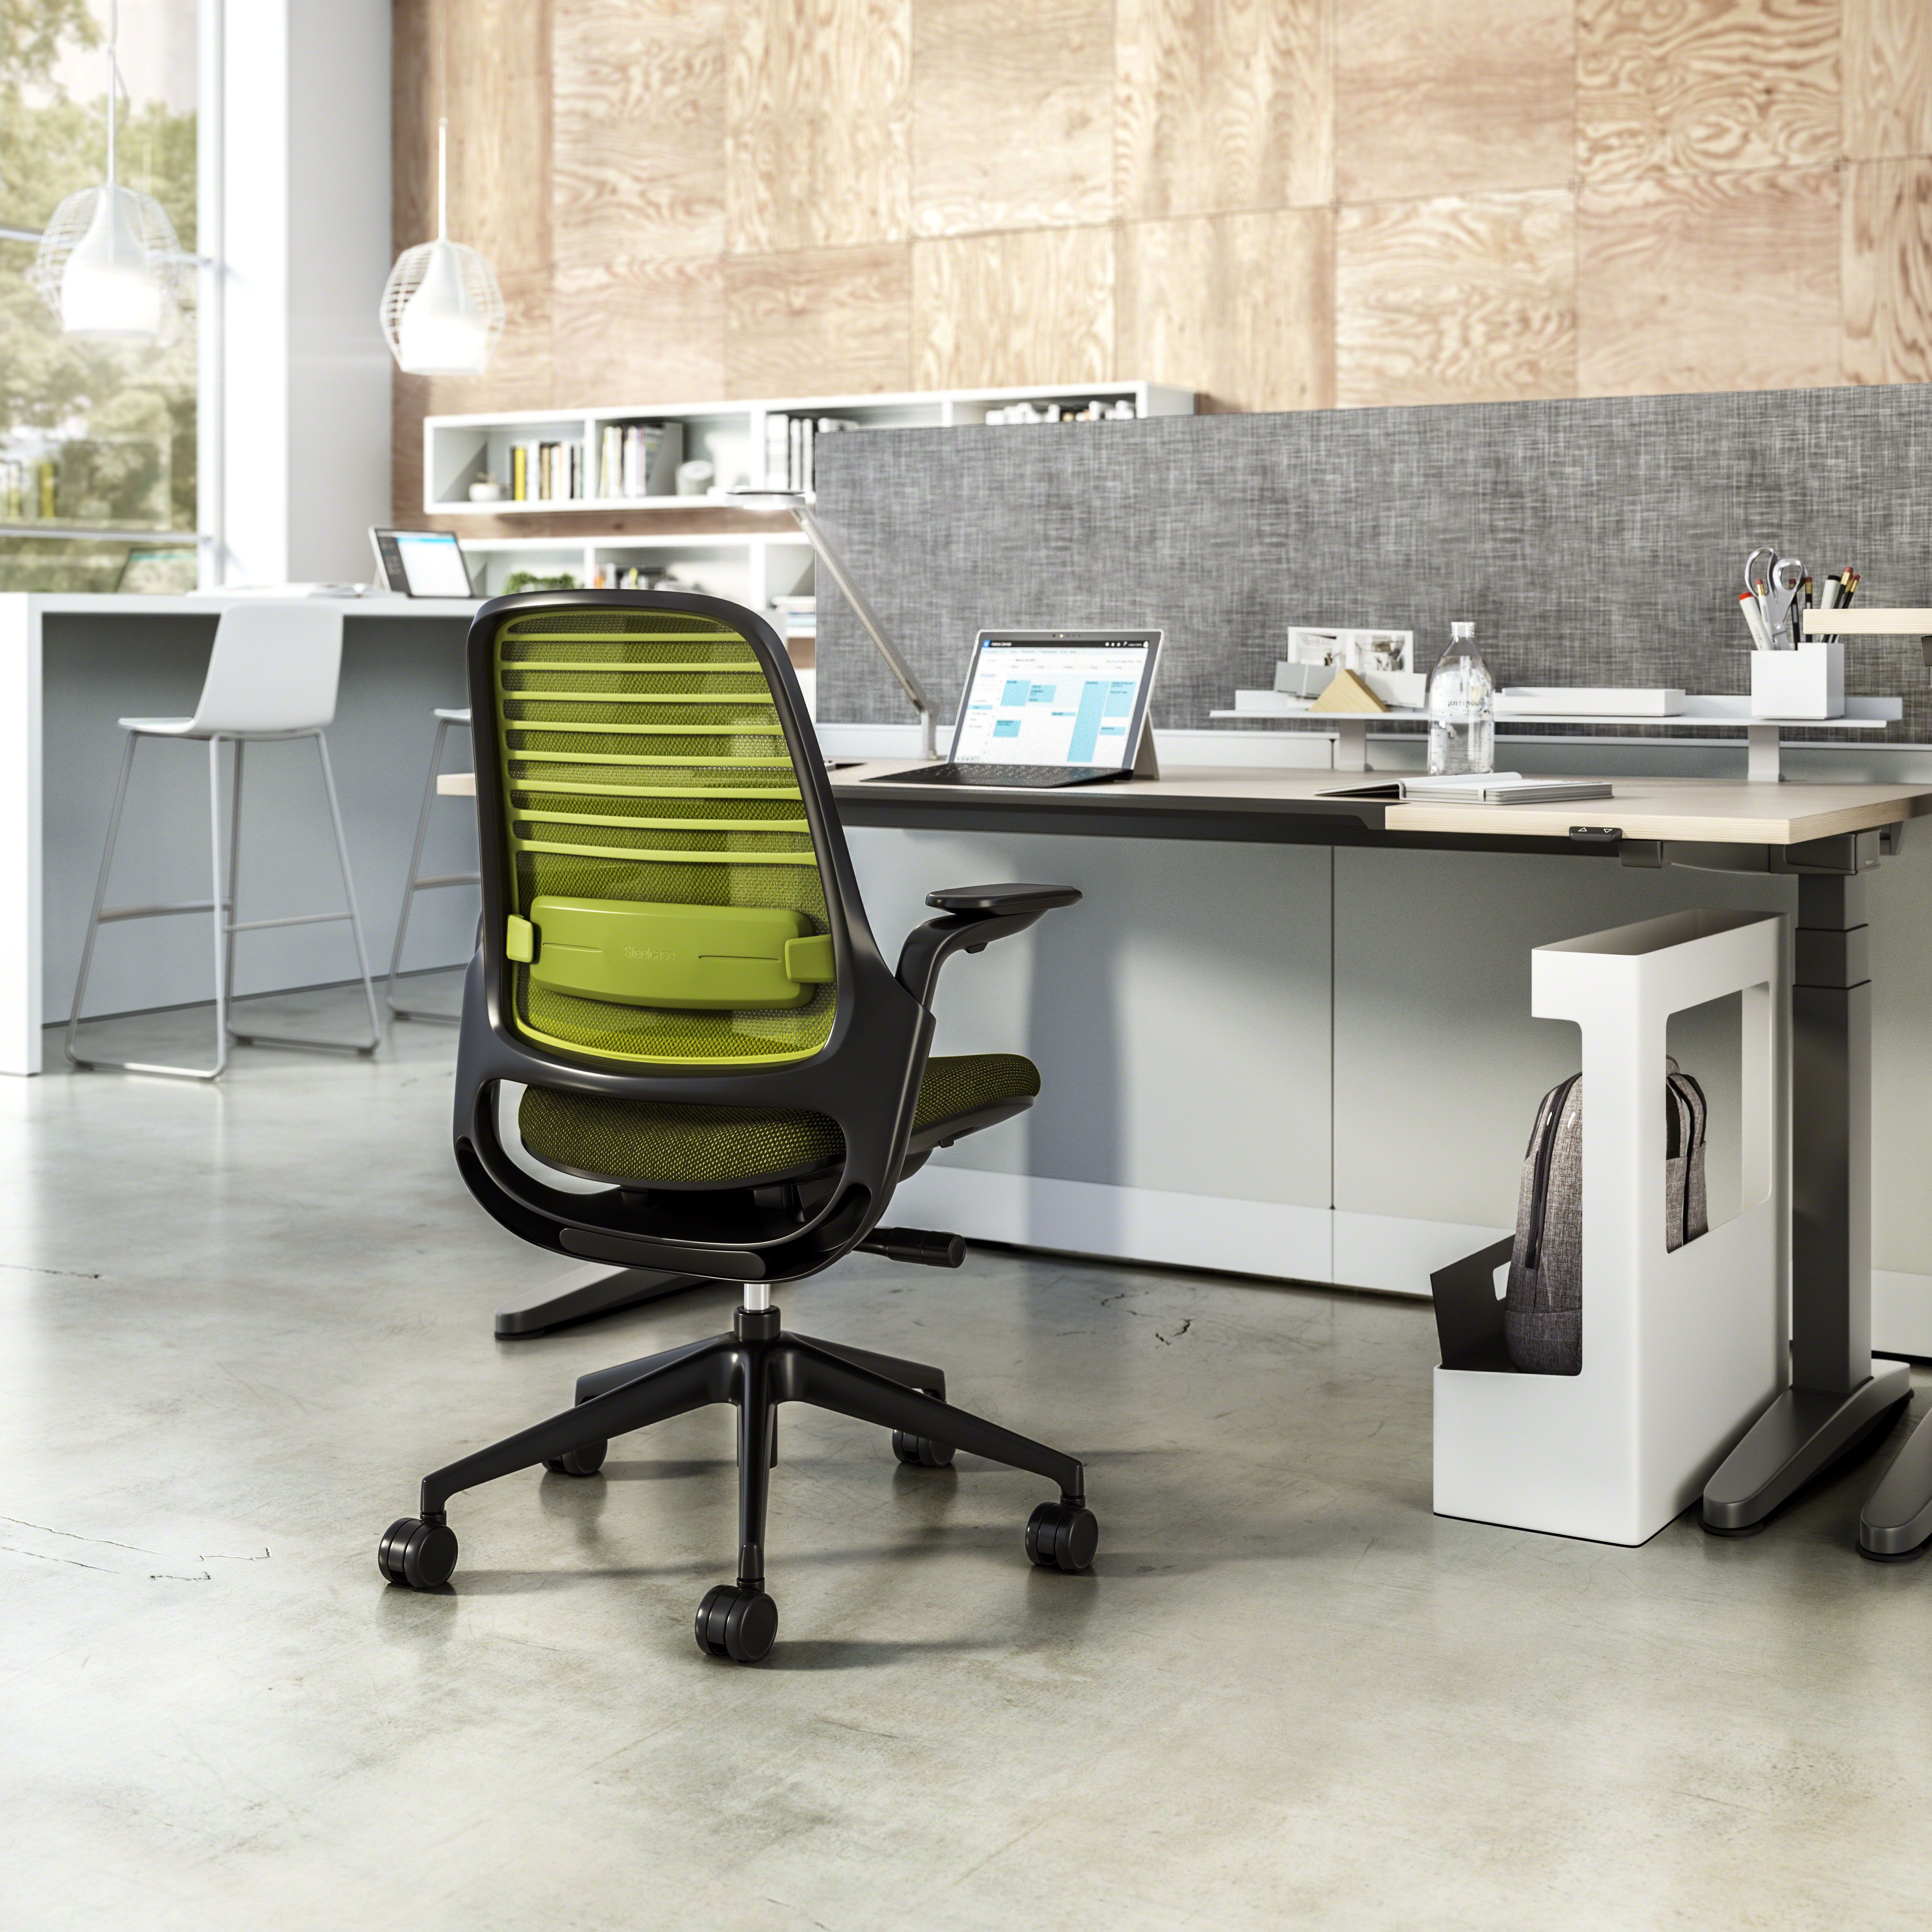 Design Inspiration Ideas For Modern Office Workspaces Steelcase Office Workspace Office Chair